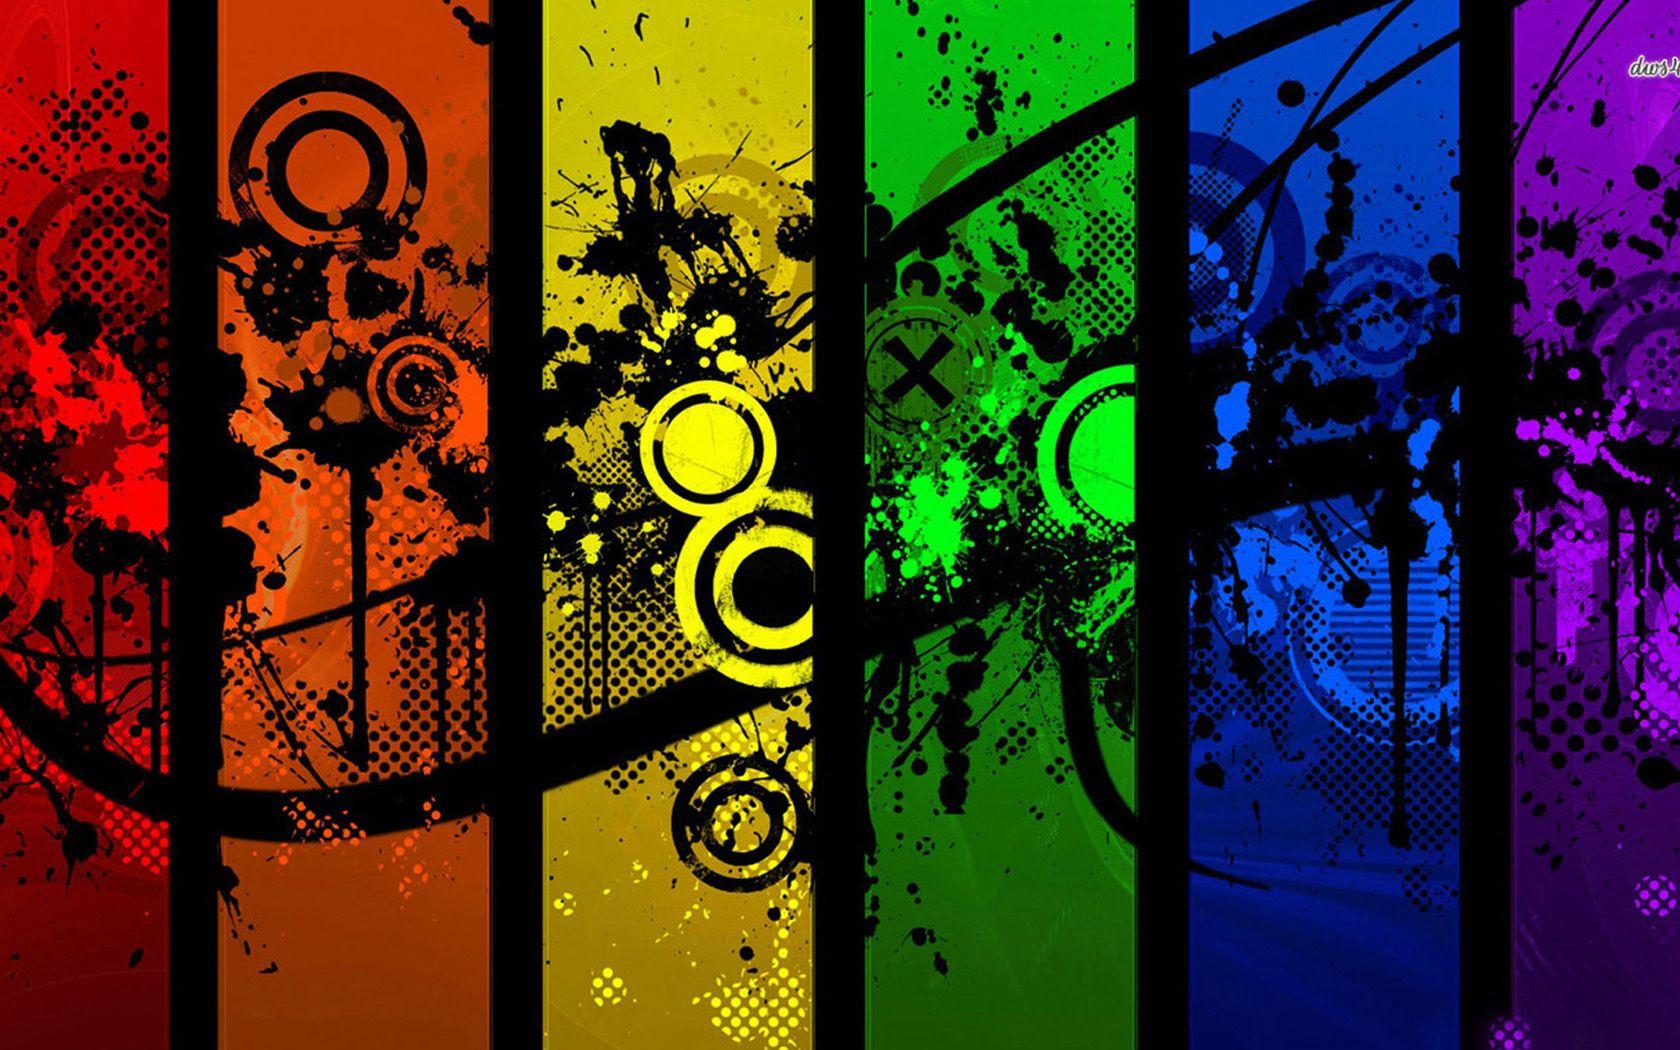 Art is resistance flag graffiti hd desktop wallpaper high art is resistance flag graffiti hd desktop wallpaper high voltagebd Image collections